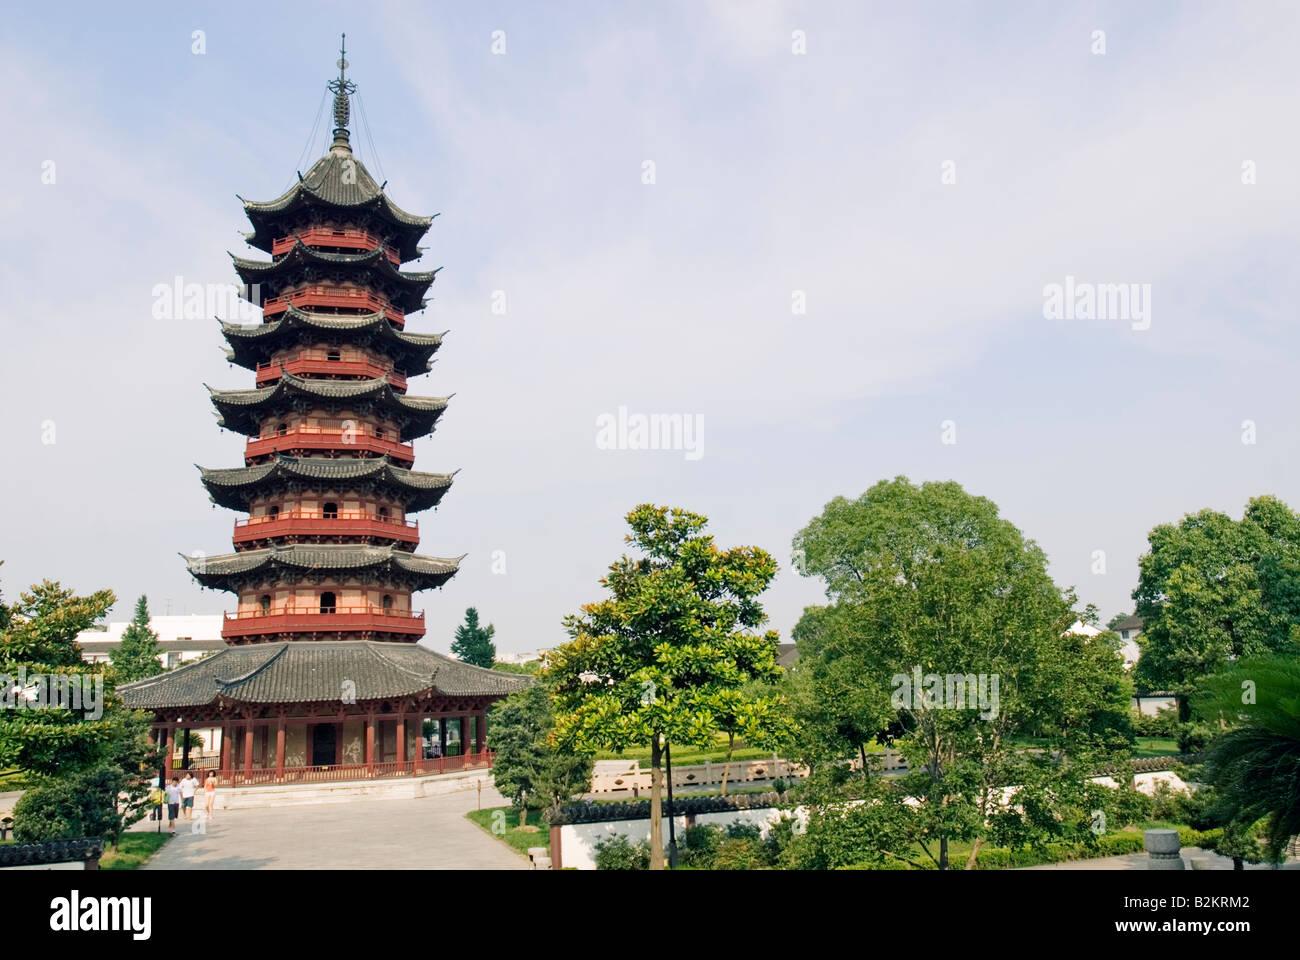 China, Suzhou, Panmen Gate, Auspicious Light Pagoda, Jiangsu Province - Stock Image